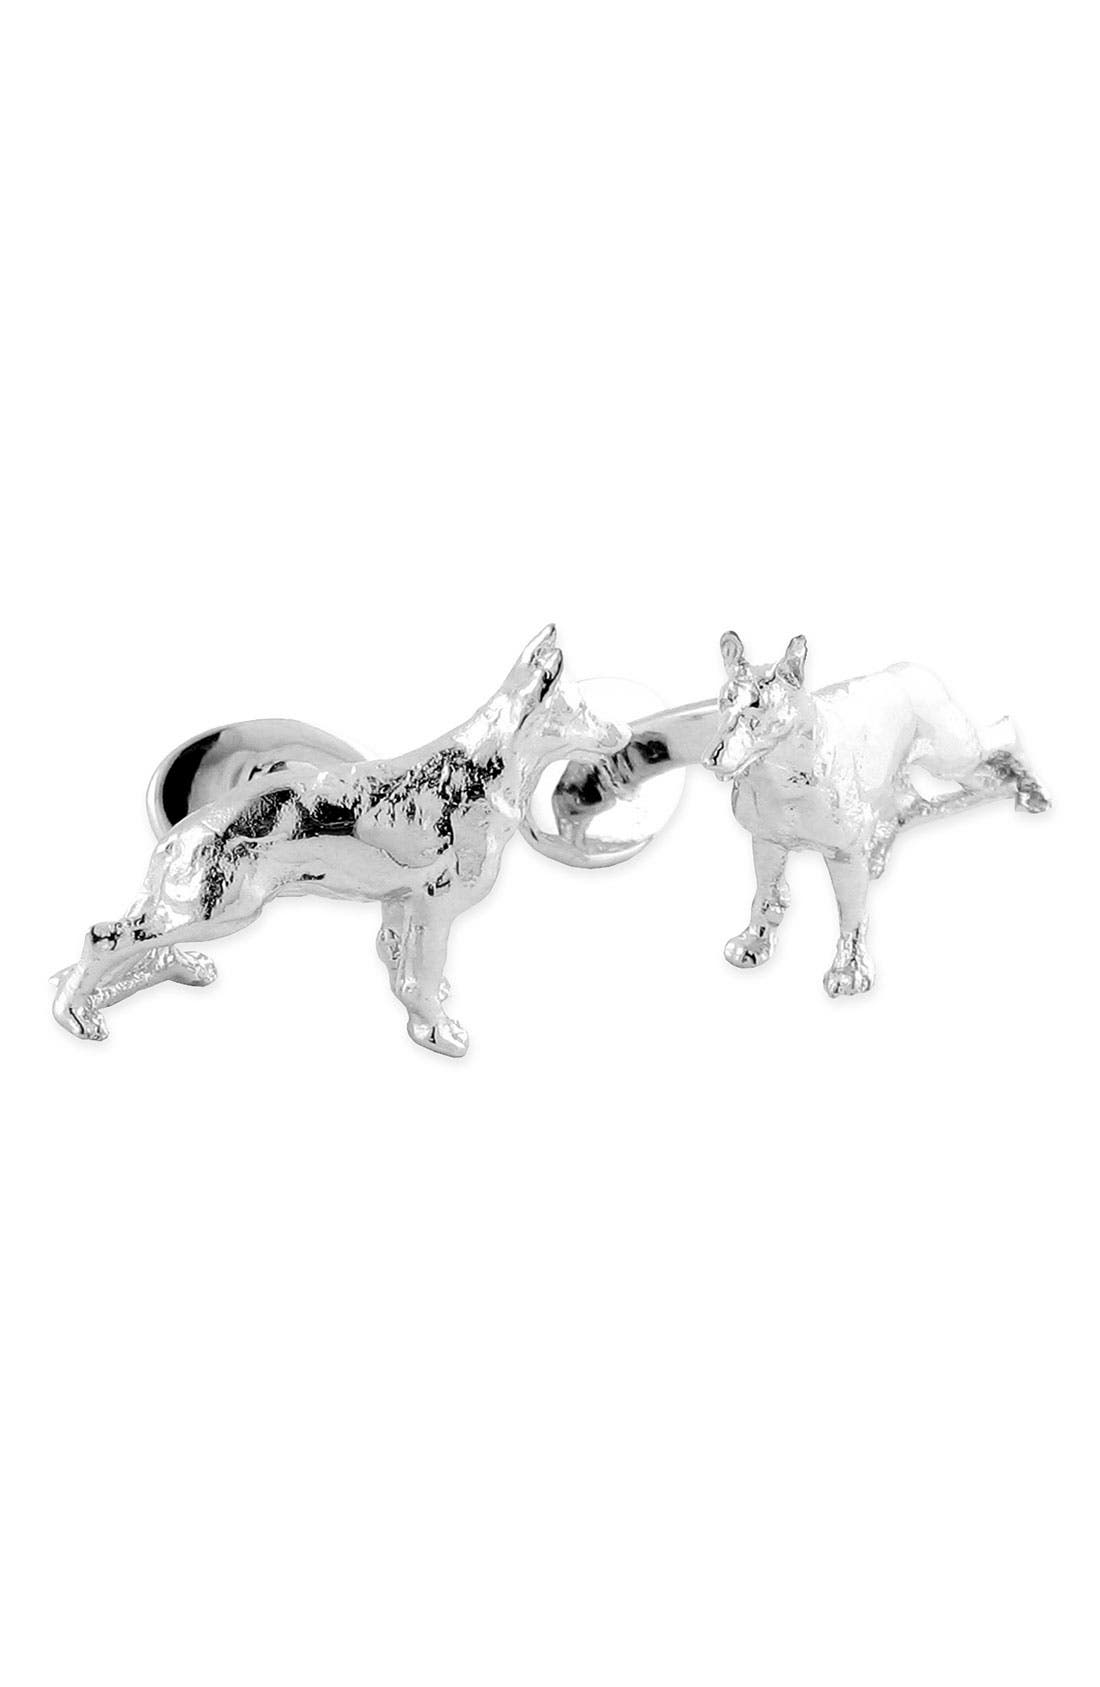 'German Shepherd' Sterling Silver Cuff Links,                         Main,                         color, Silver